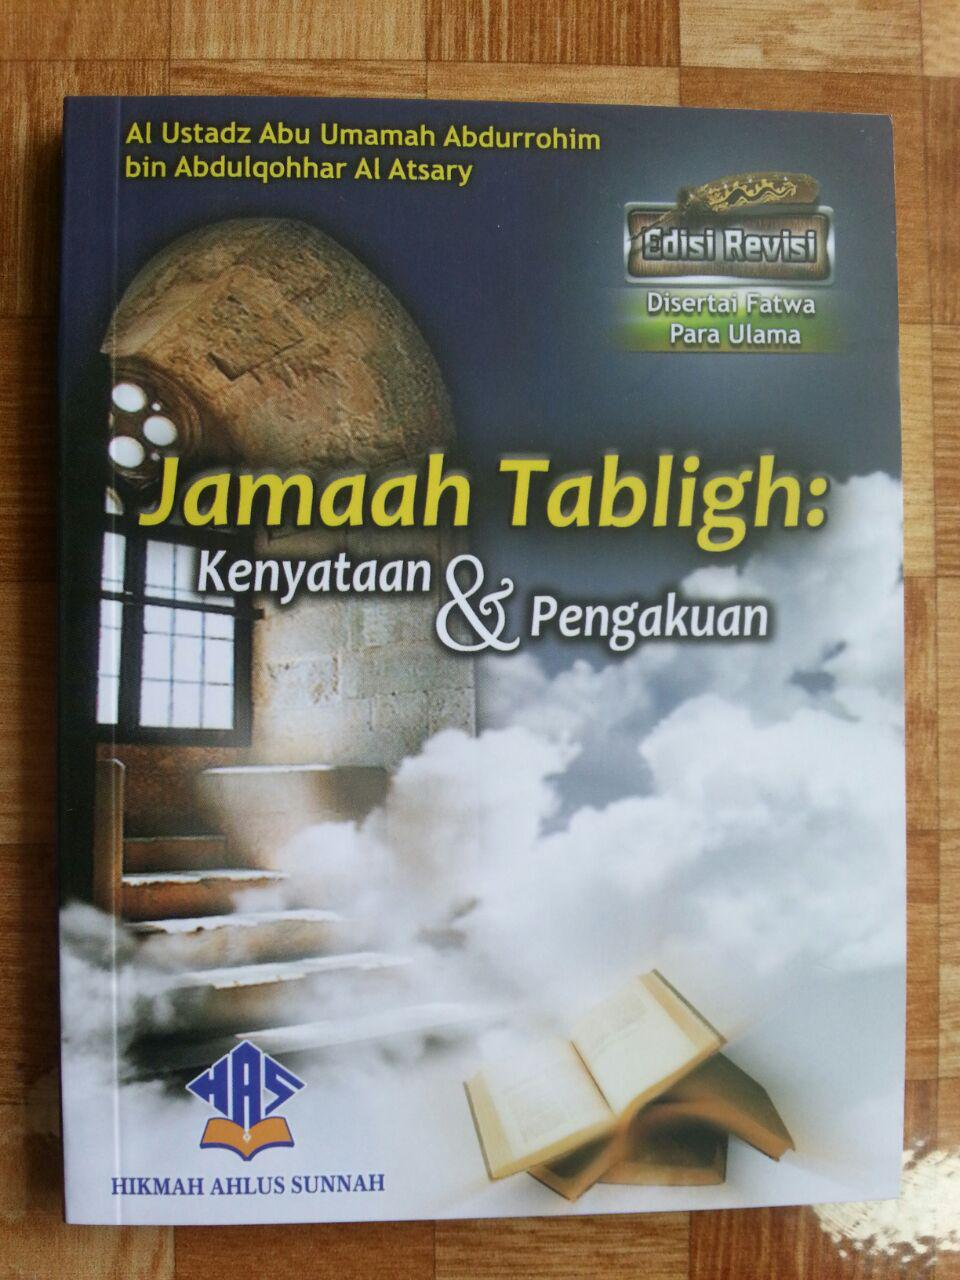 Buku Jamaah Tabligh Kenyataan Dan Pengakuan cover 2